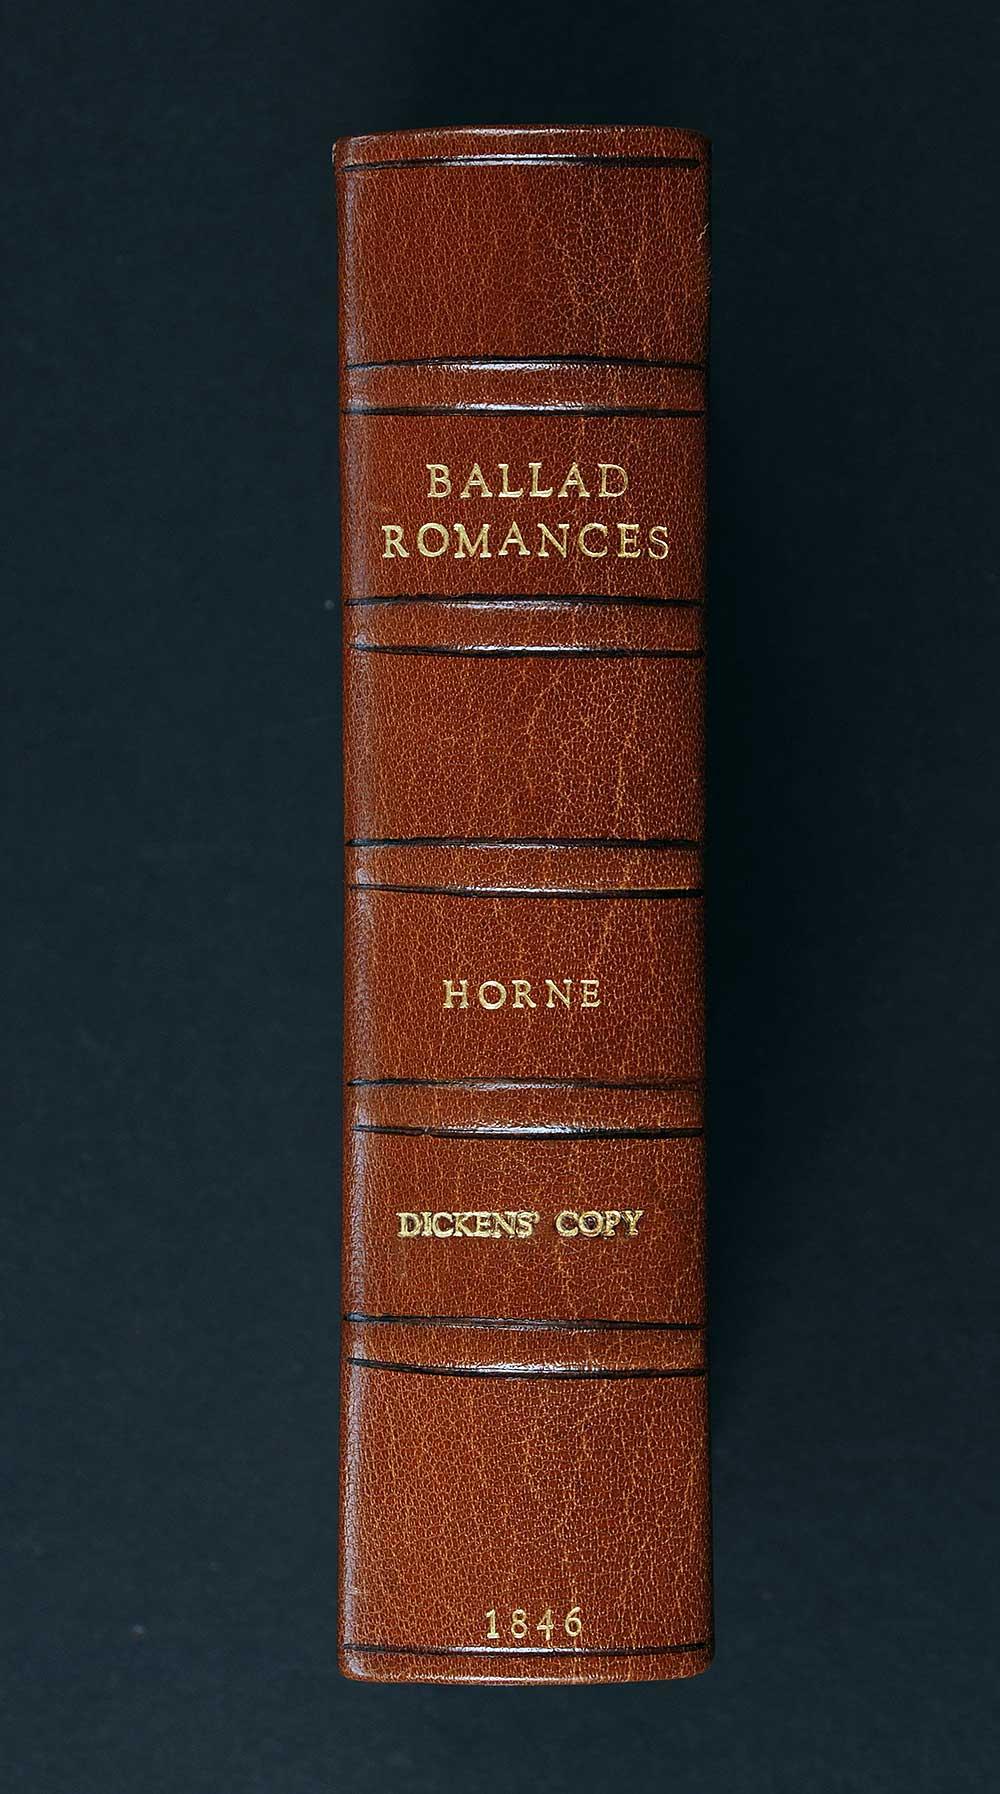 Richard H. Horne. <em>Ballad romances</em>. London: Charles Ollier, 1846.